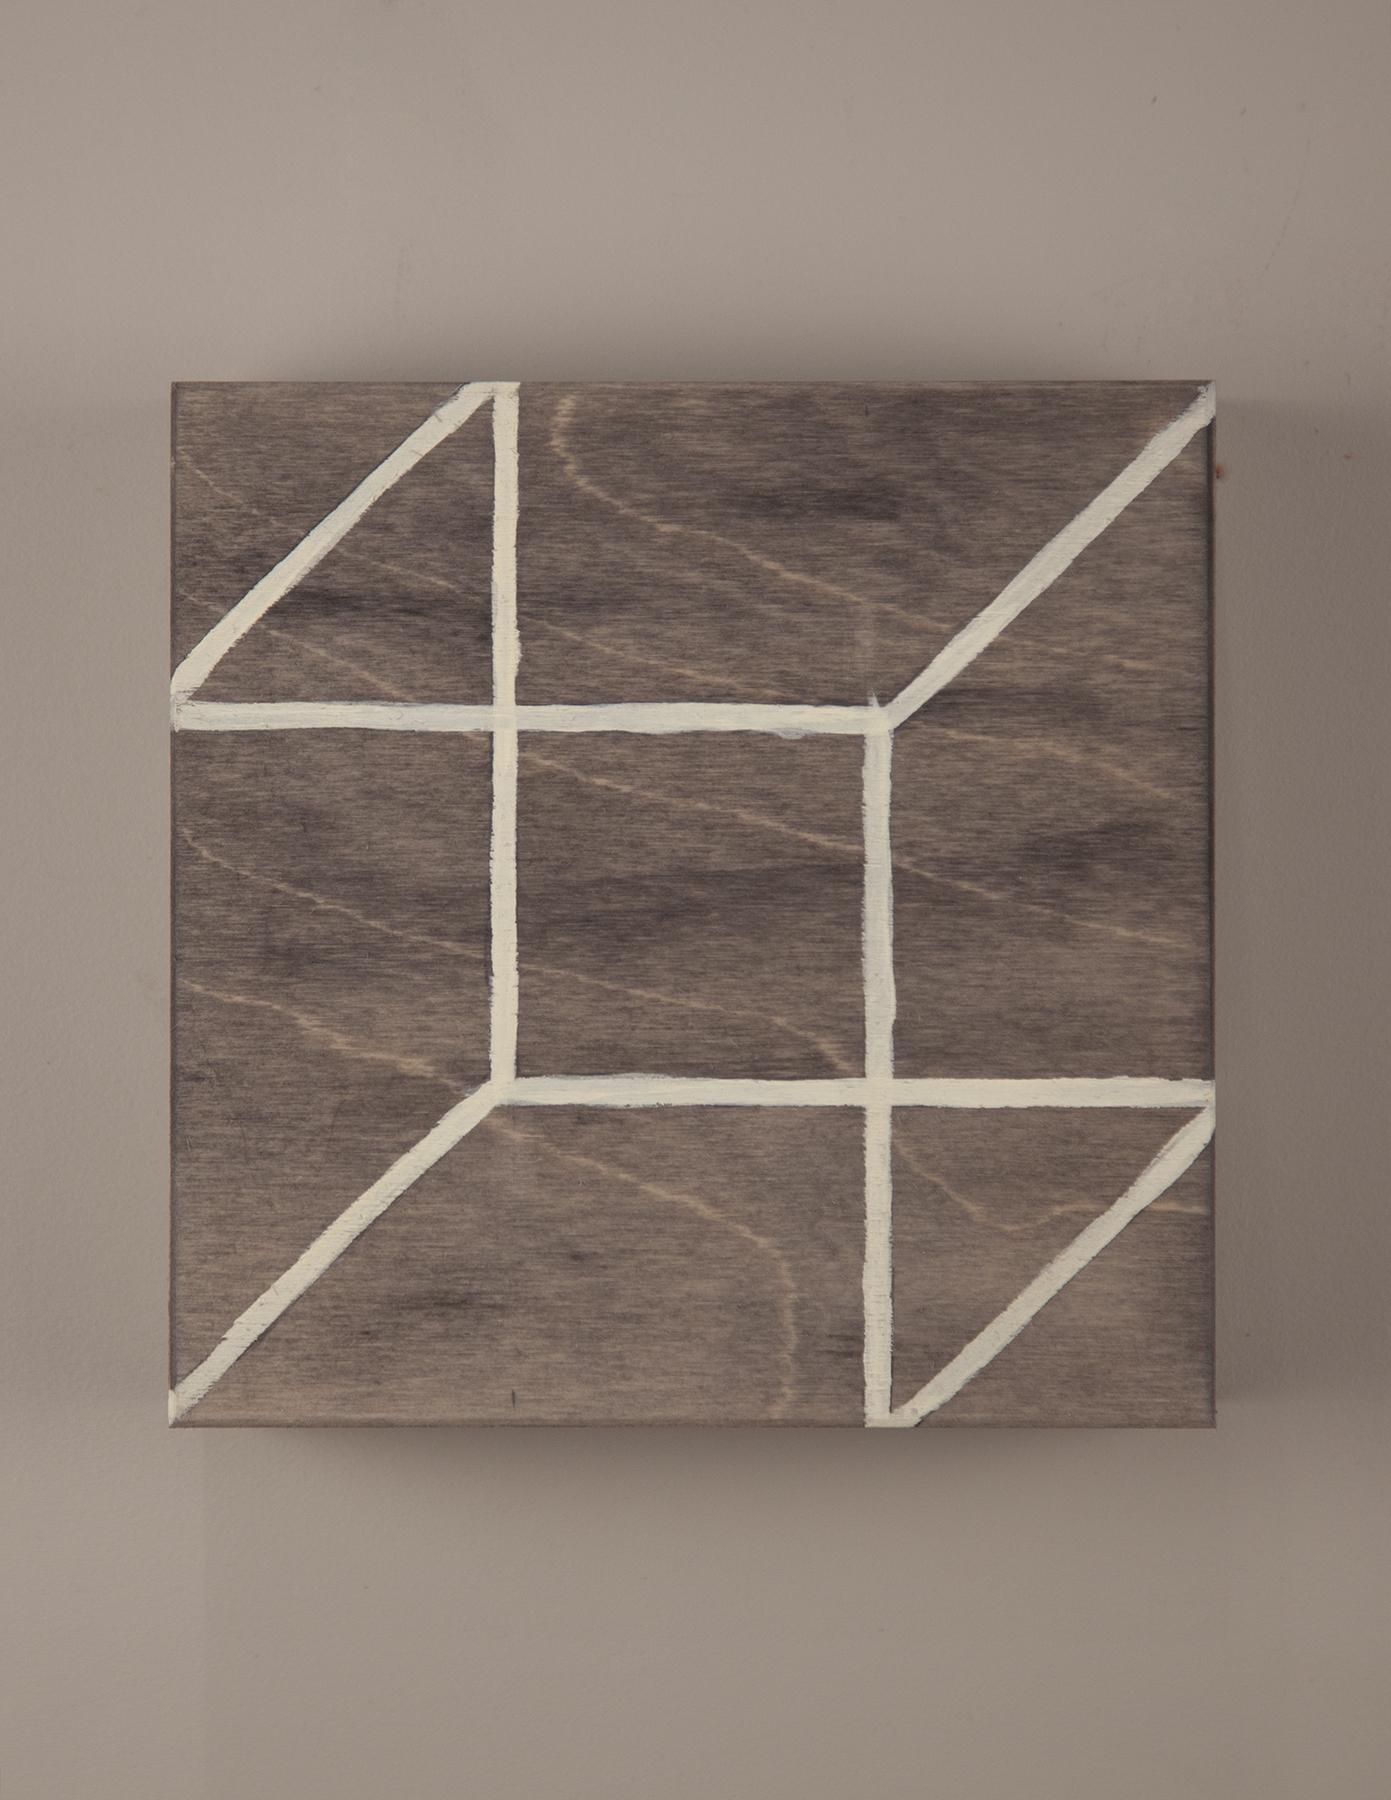 The Pessimist Cube